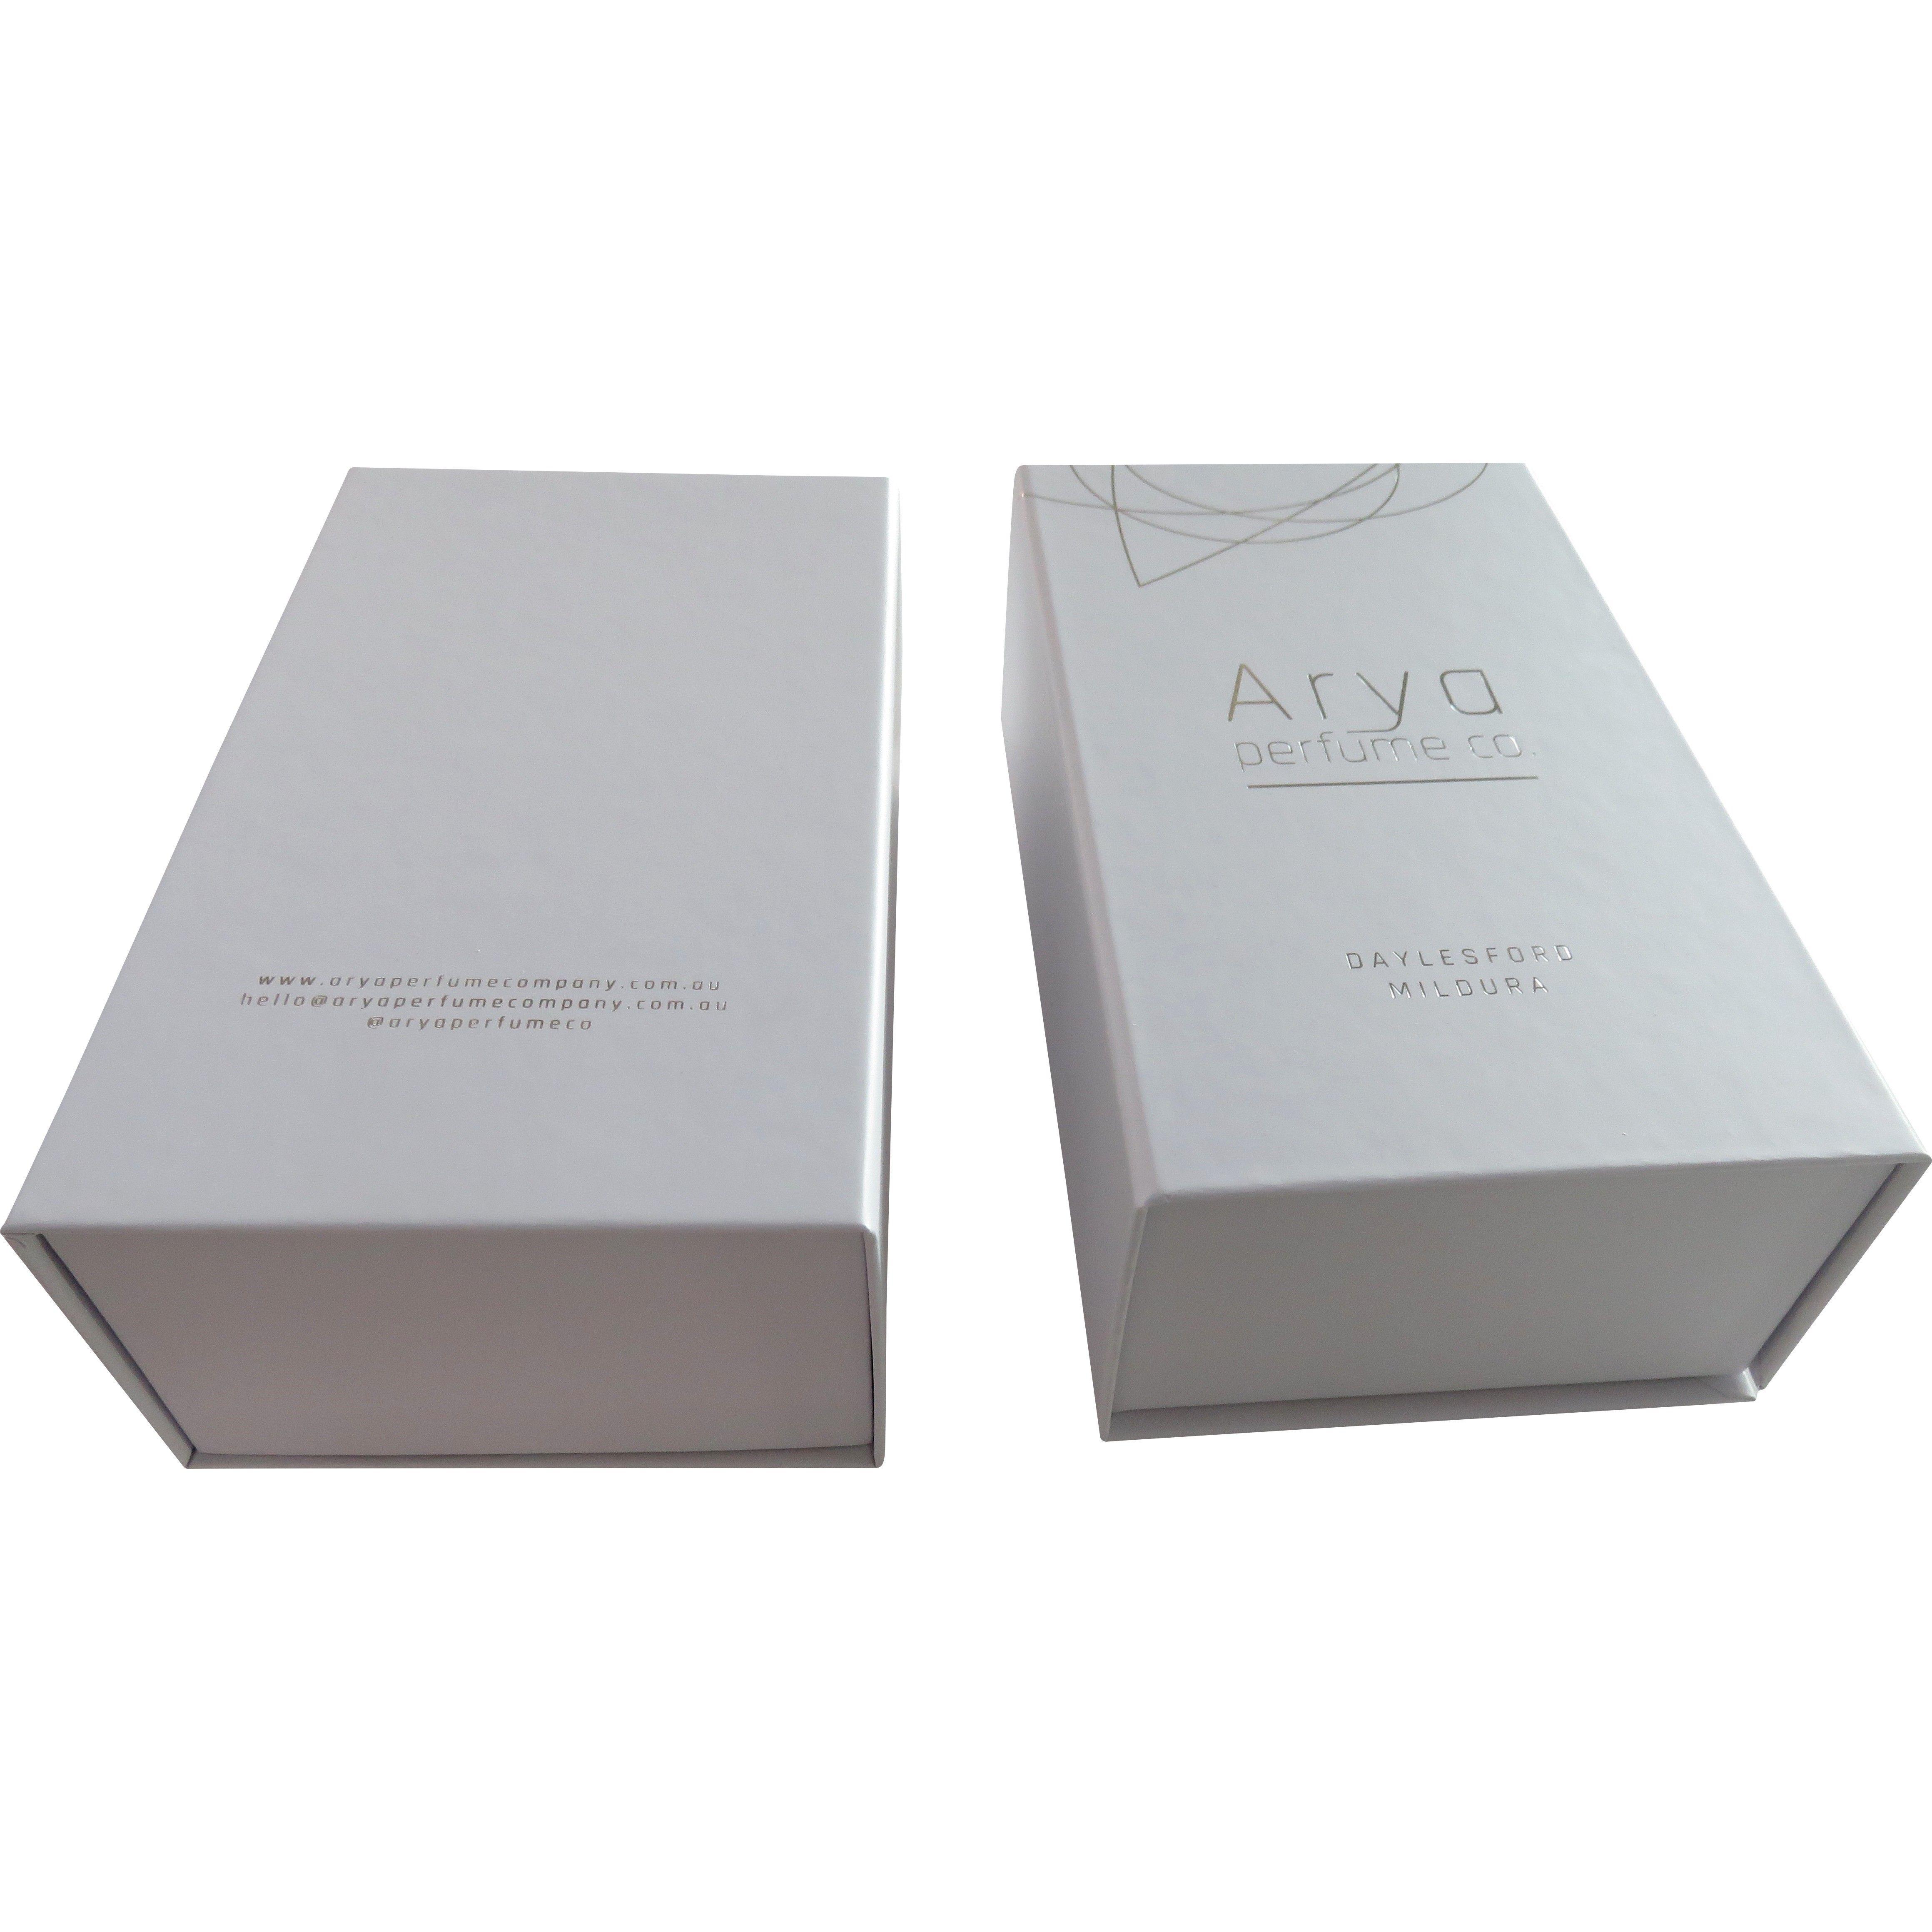 Luxury product packaging Rigid box white matte